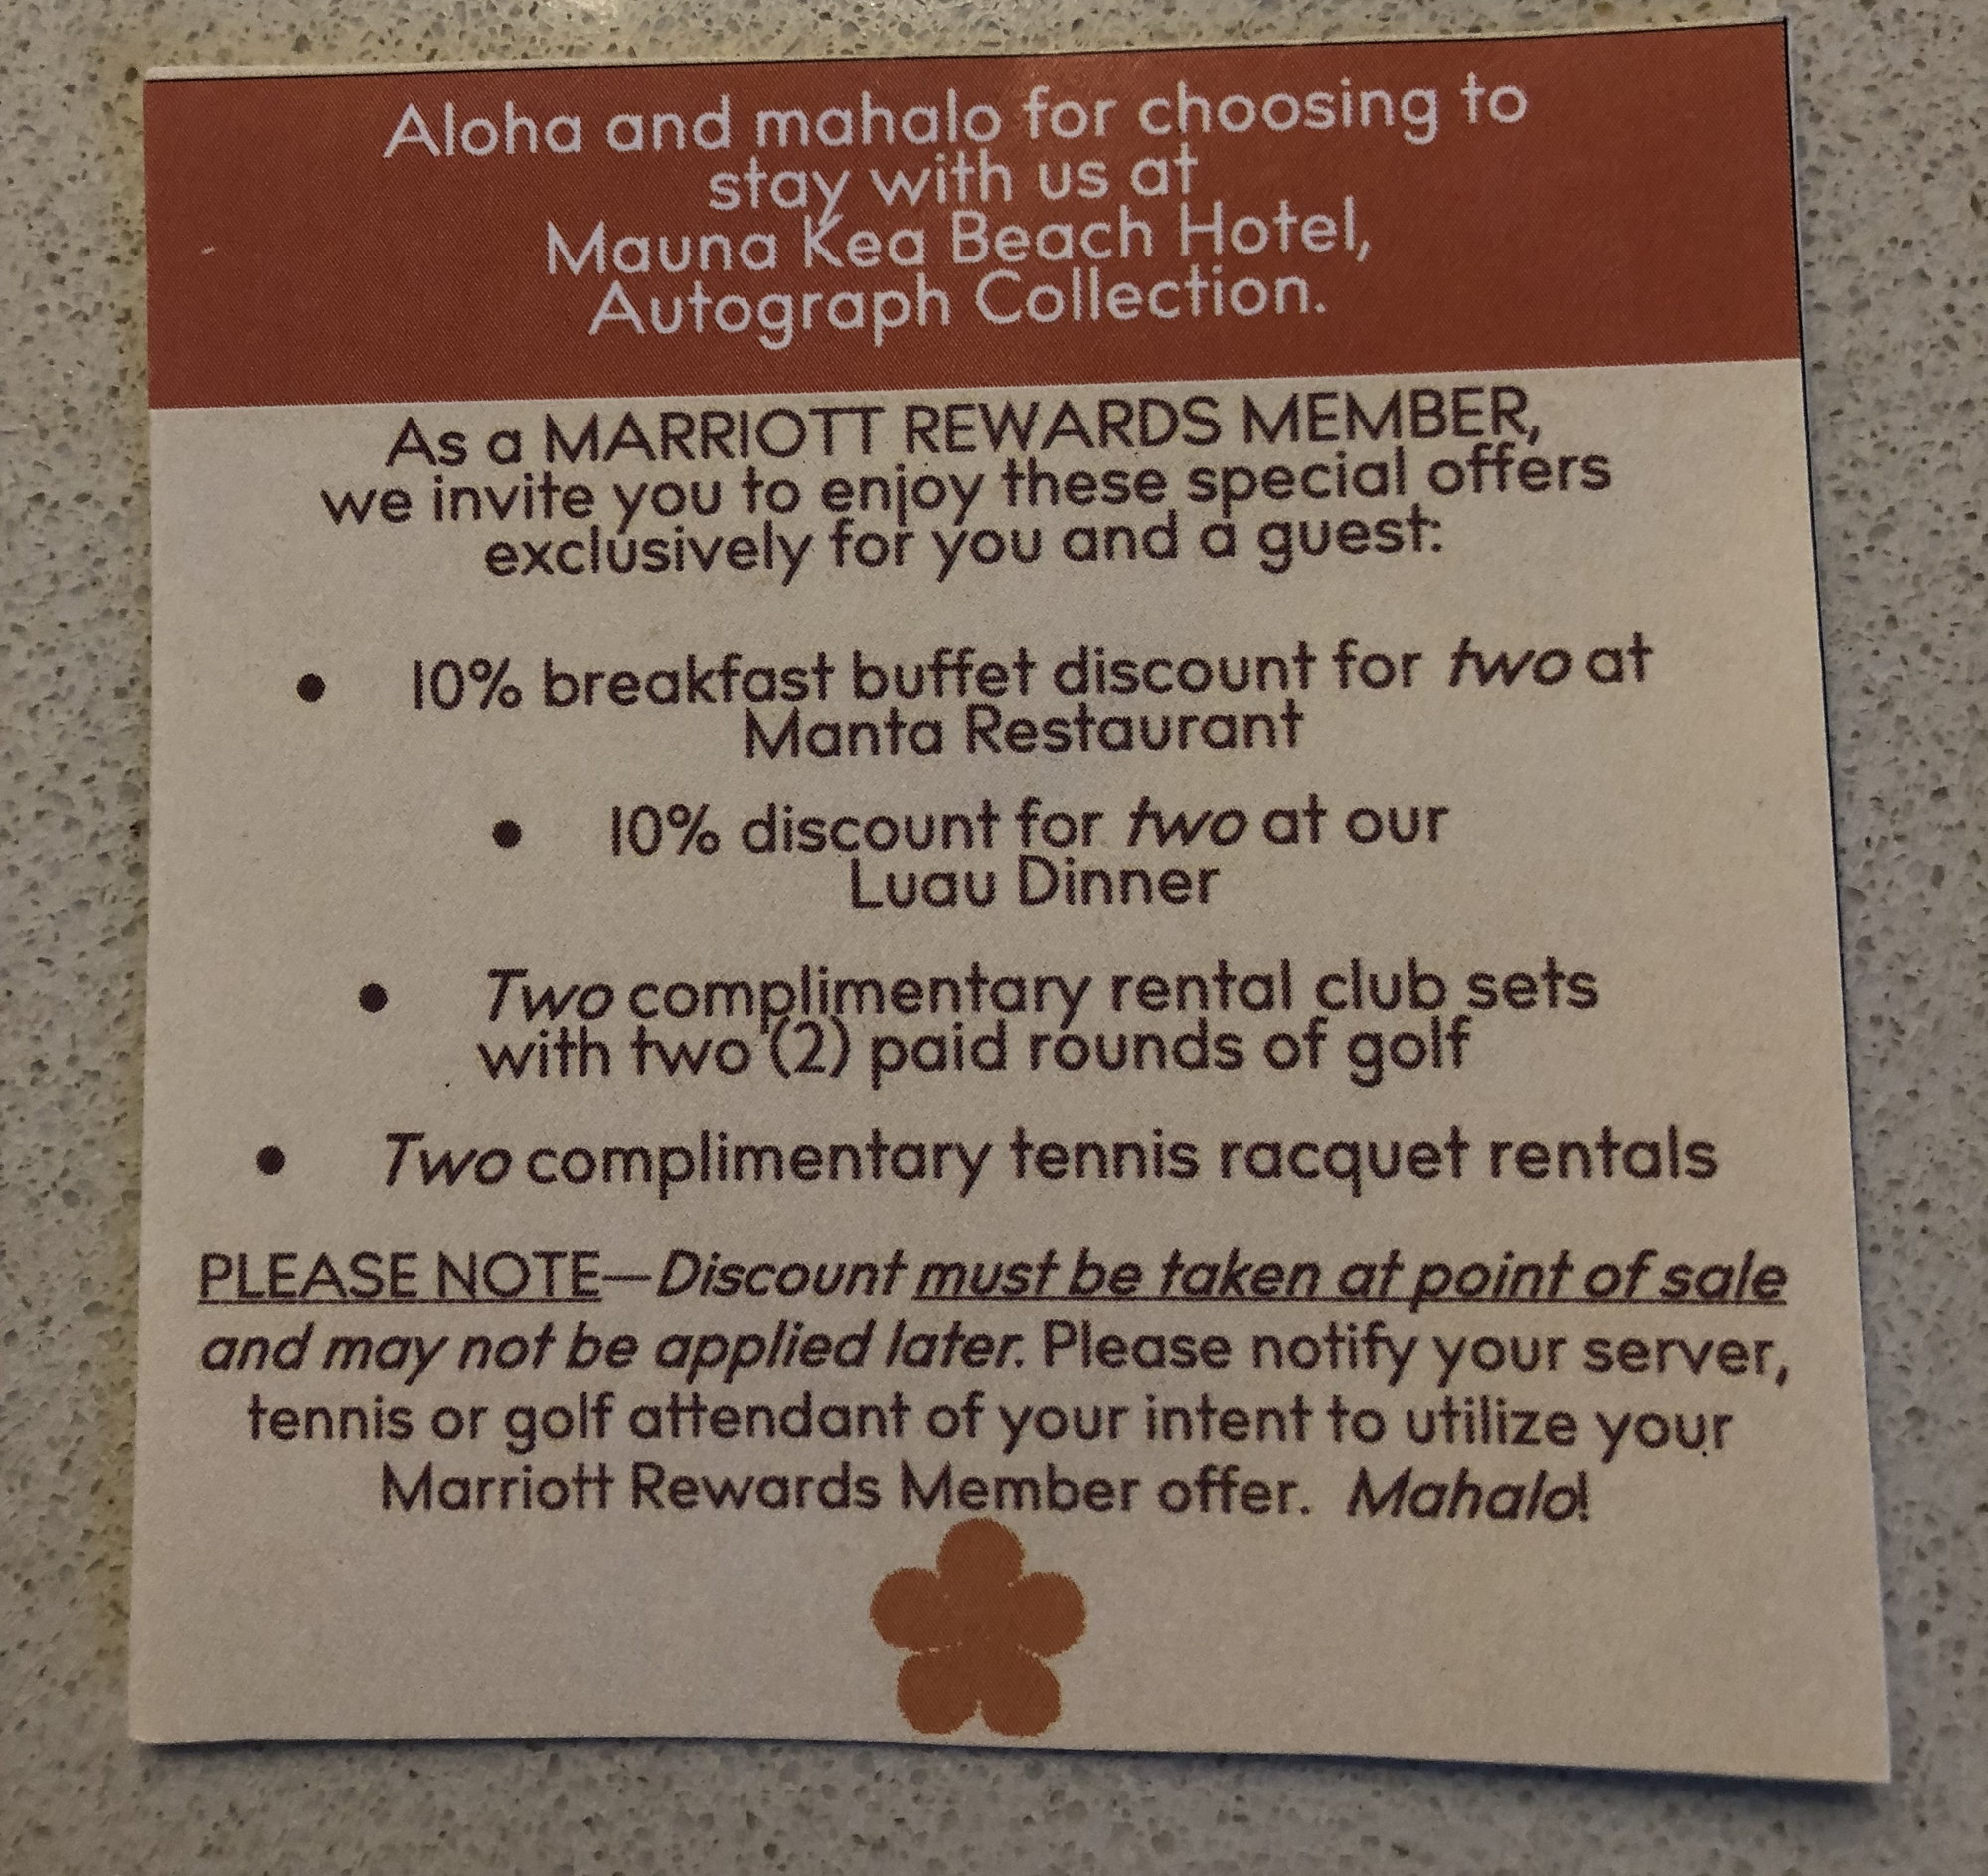 Mauna Kea Beach Hotel Autograph Collection, Big Island of